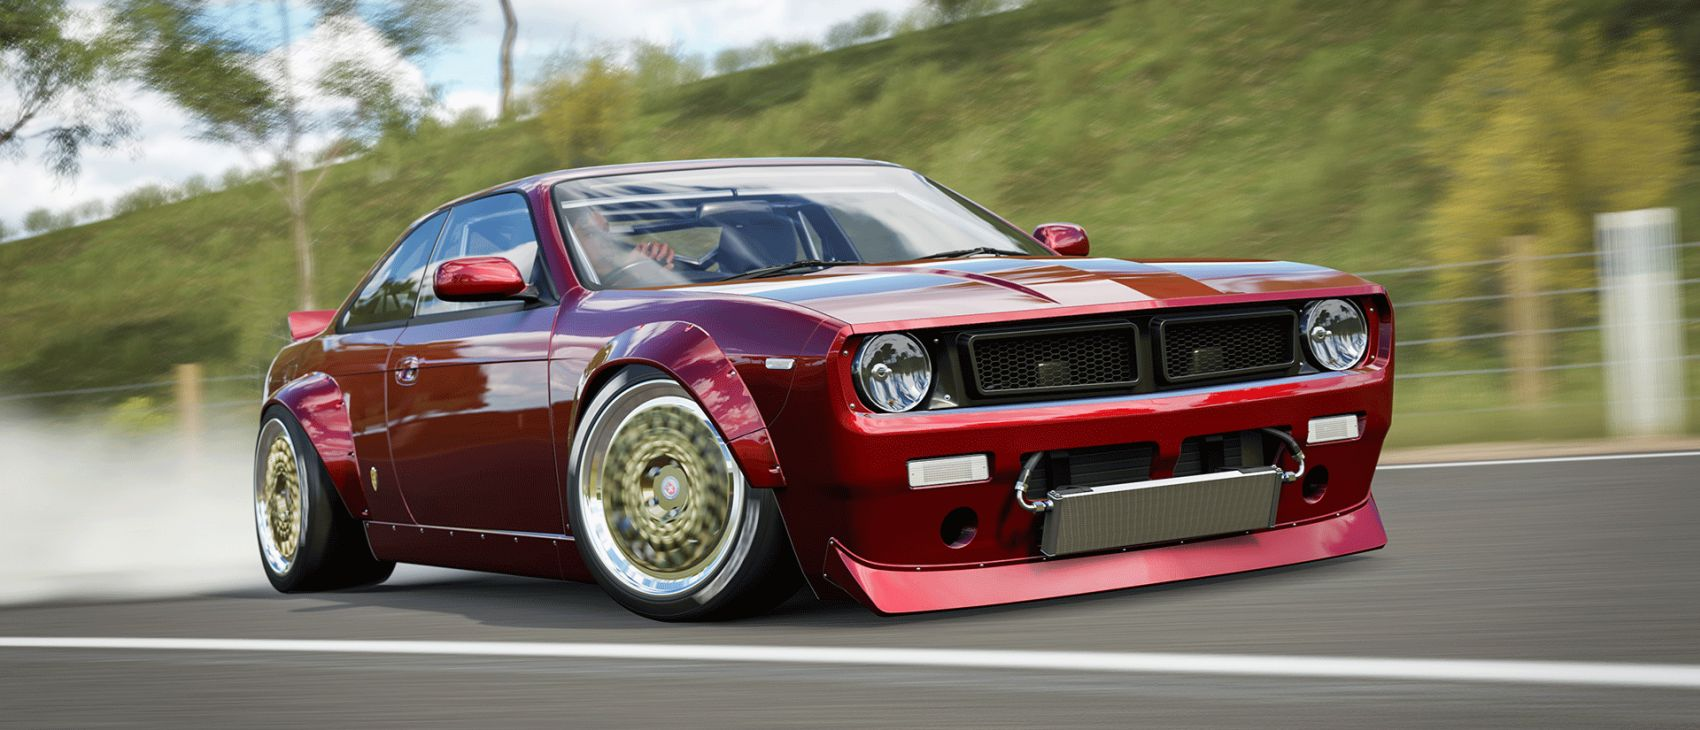 Alpinestars Car Pack brings seven new cars to Forza Horizon 3, and